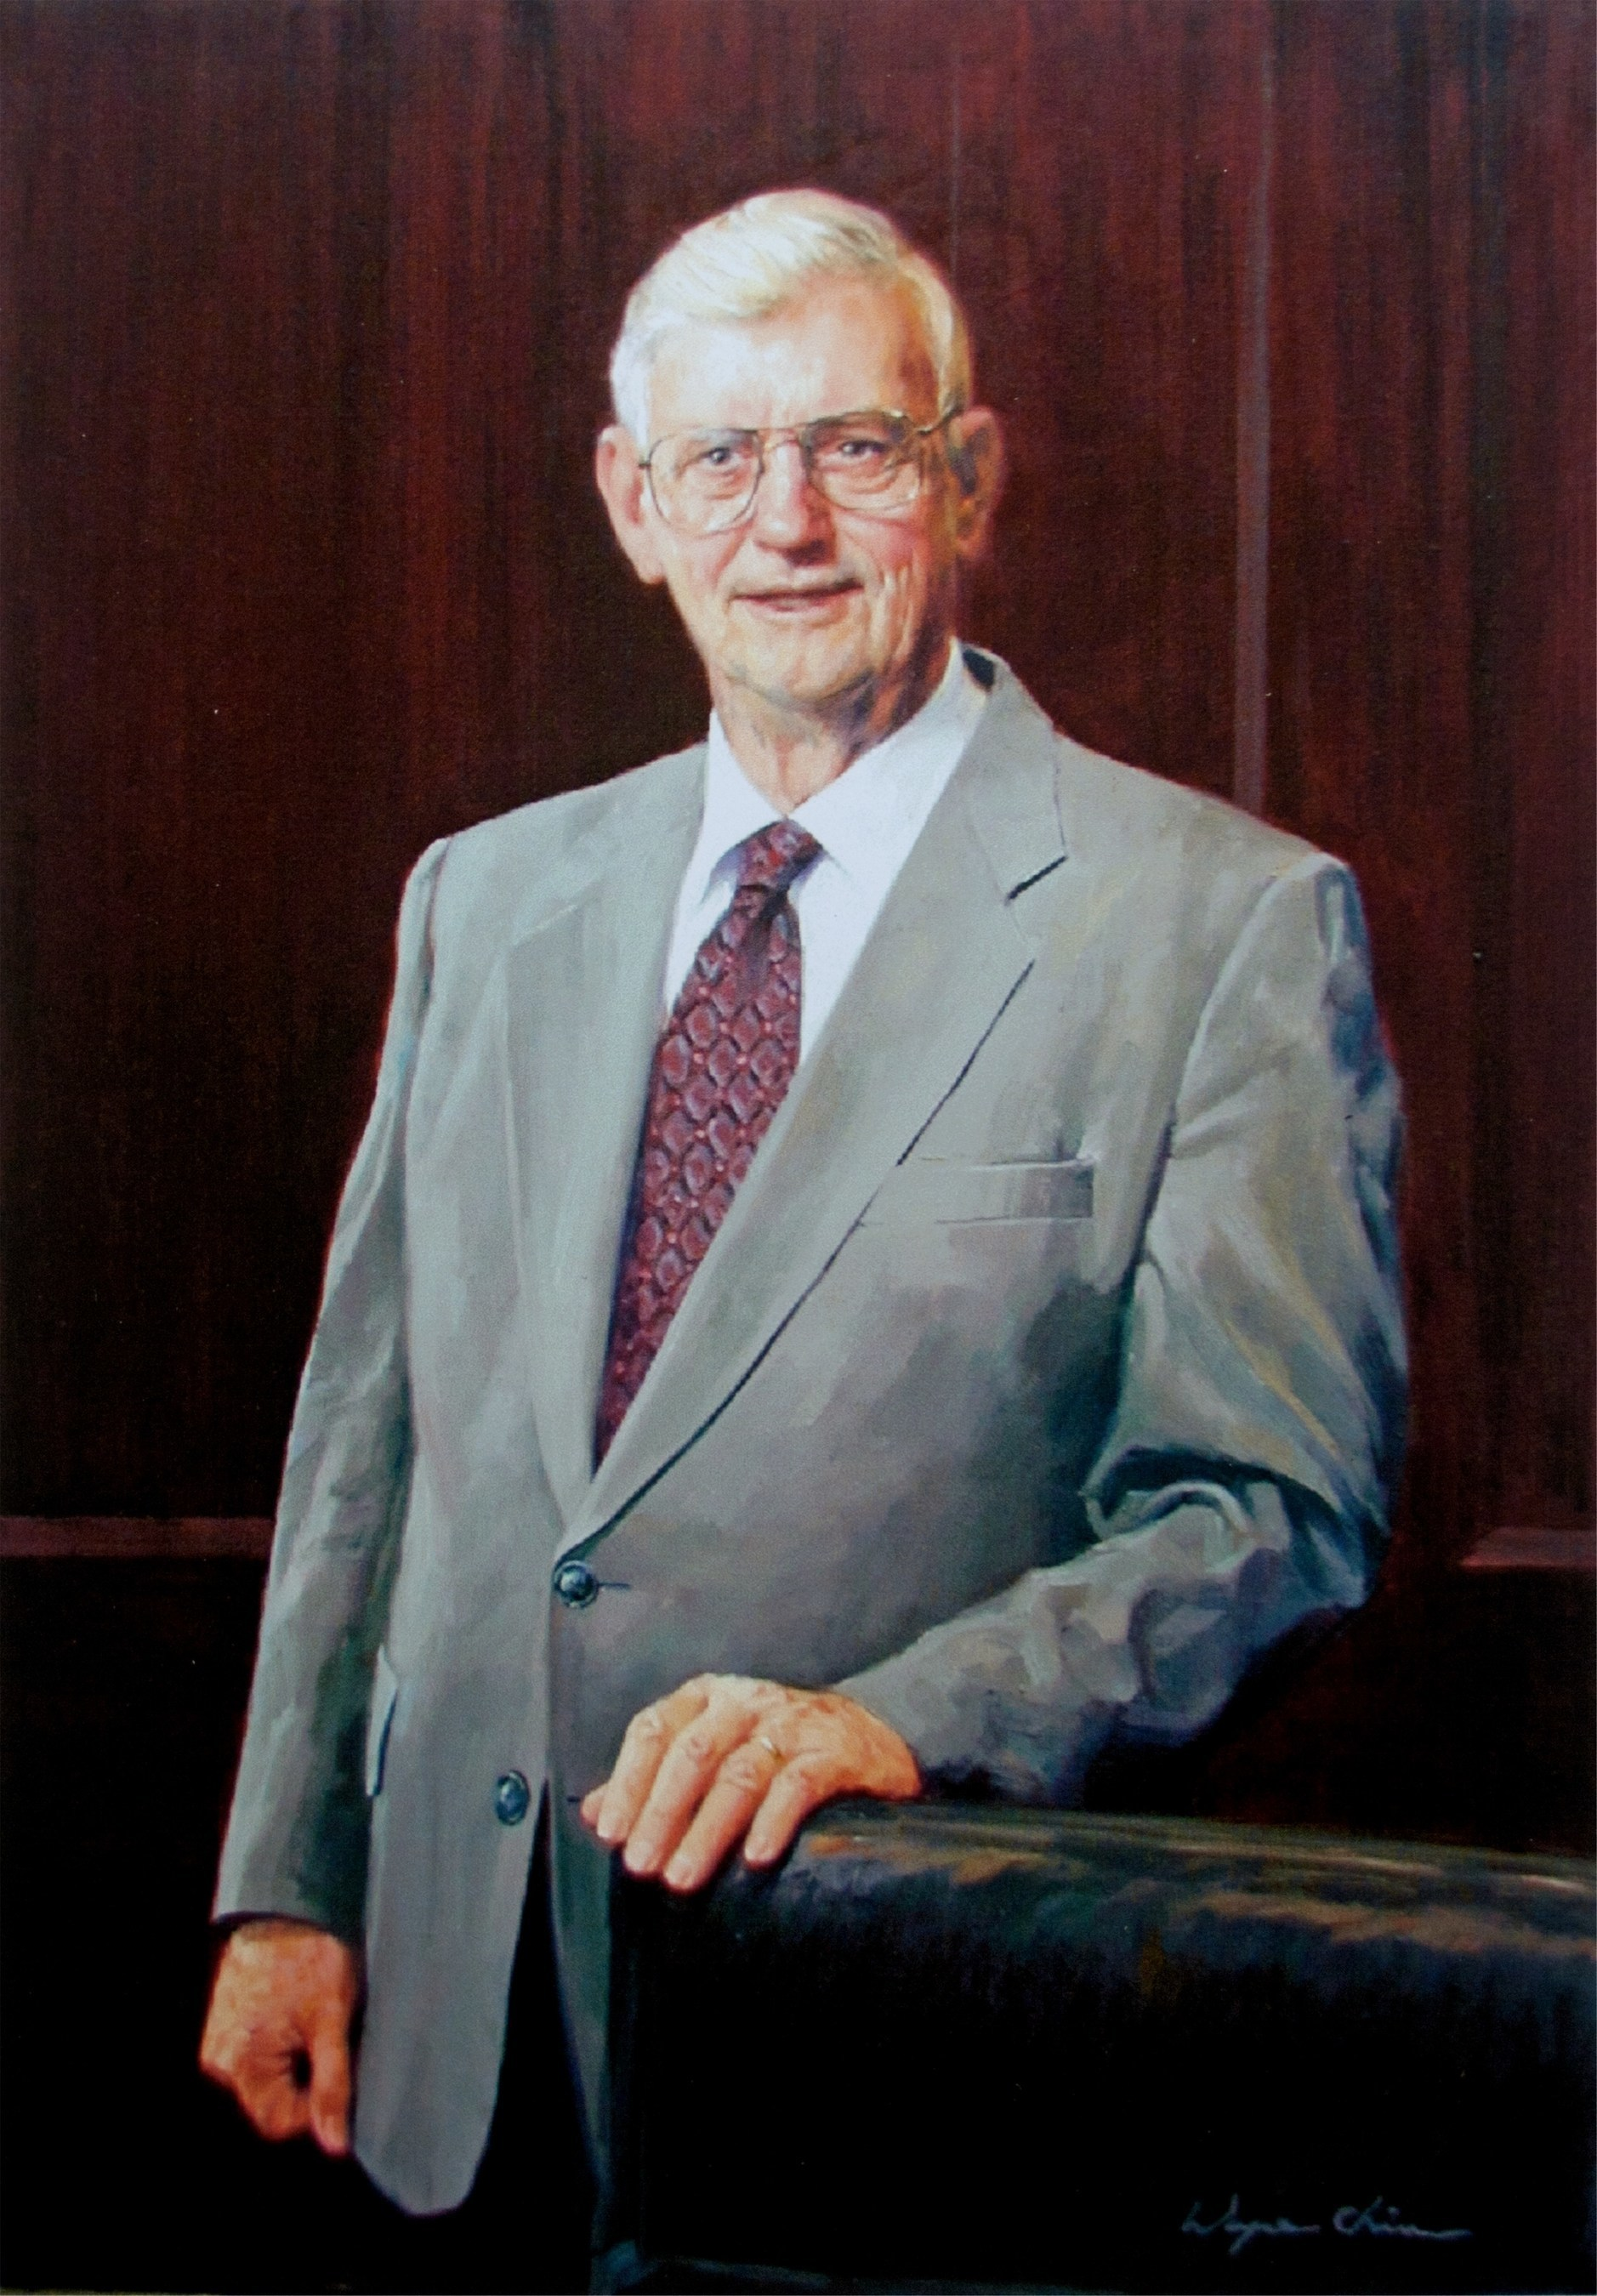 Hon. Edward Leavy